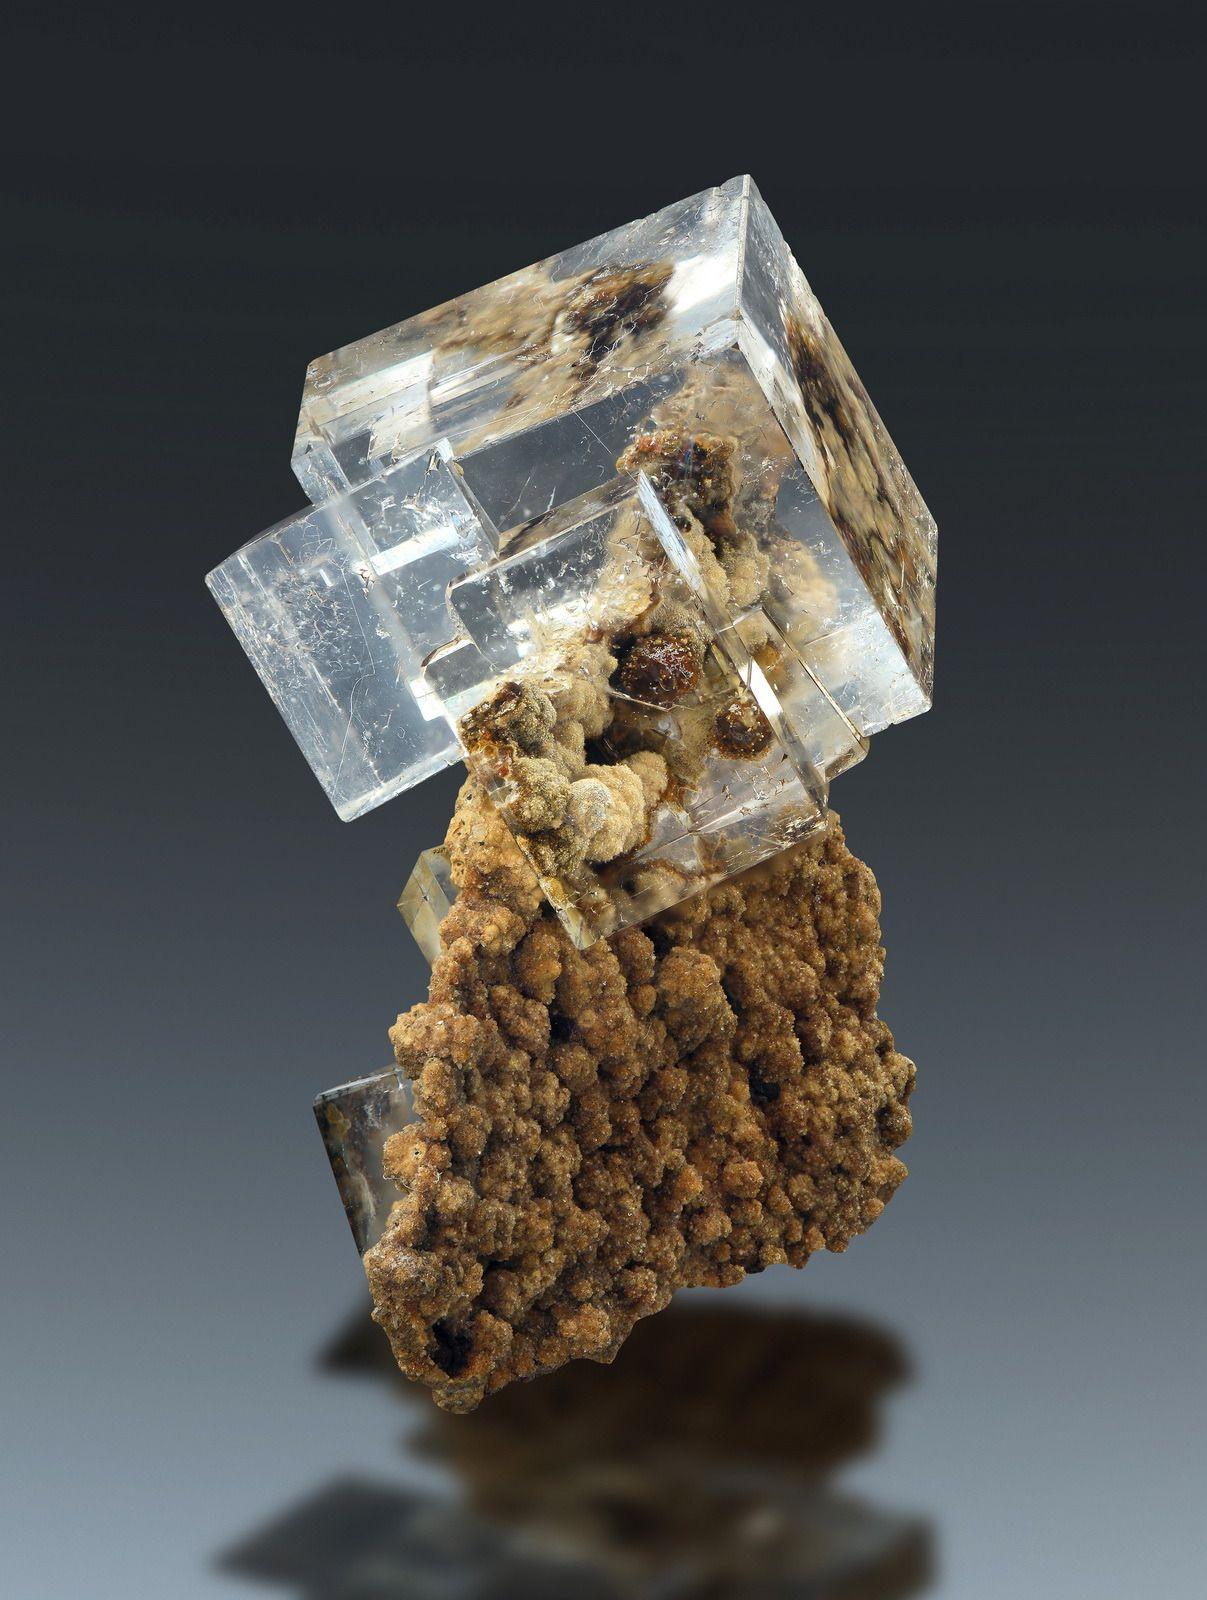 Fluorite On Matrix Dal Negorsk Primorskiy Kray Far Eastern Region Russia Source Awminerals Crystals Minerals Minerals And Gemstones Rocks And Minerals